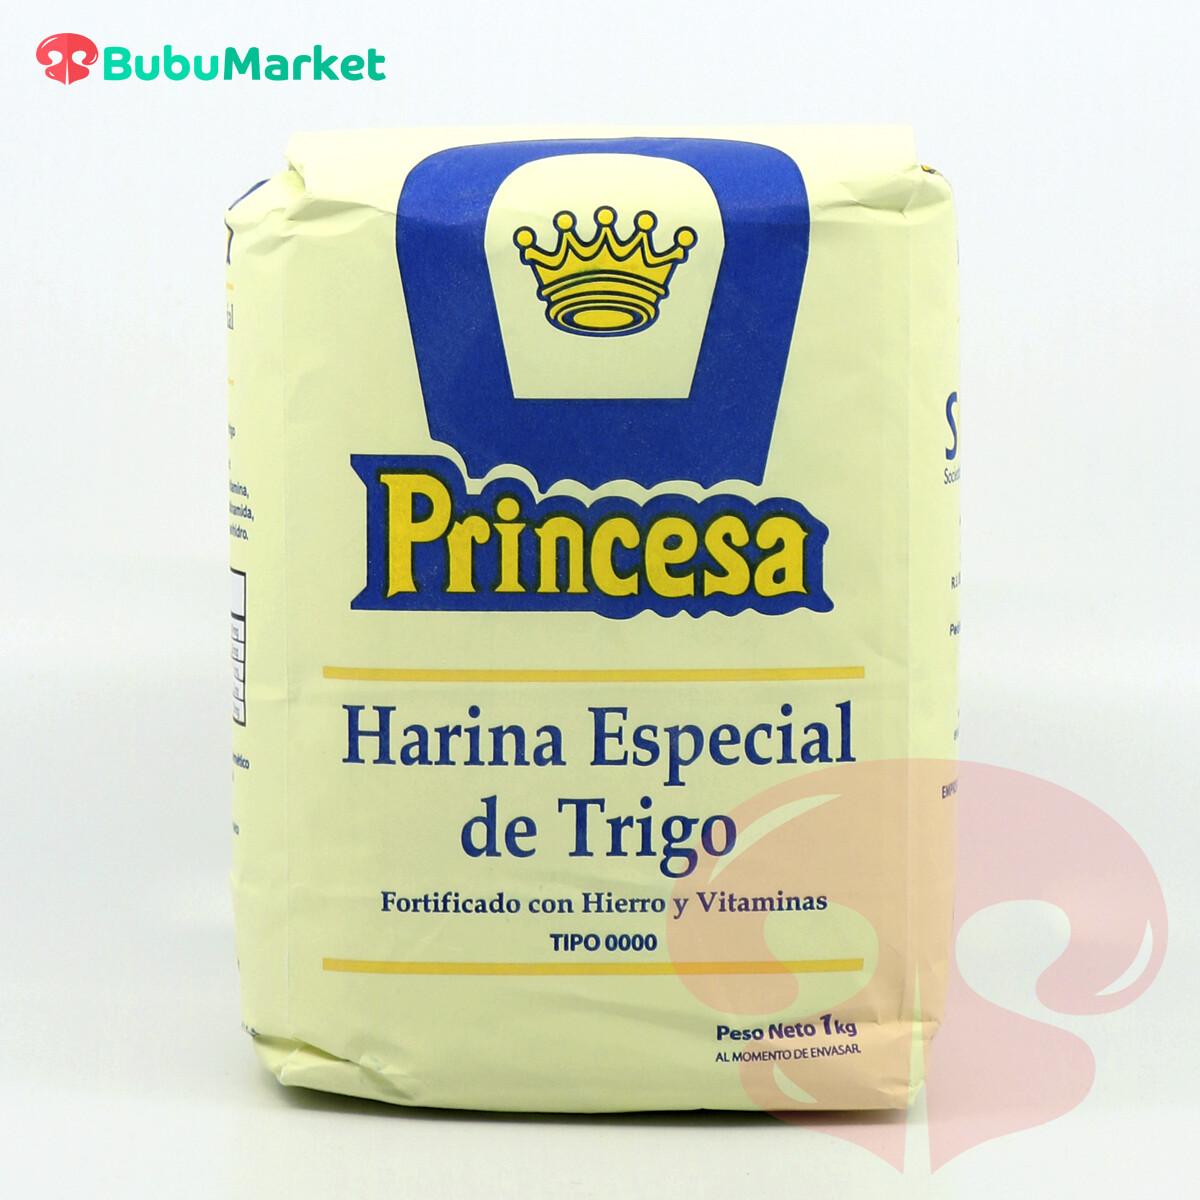 HARINA ESPECIAL DE TRIGO PRINCESA DE 1 KG.